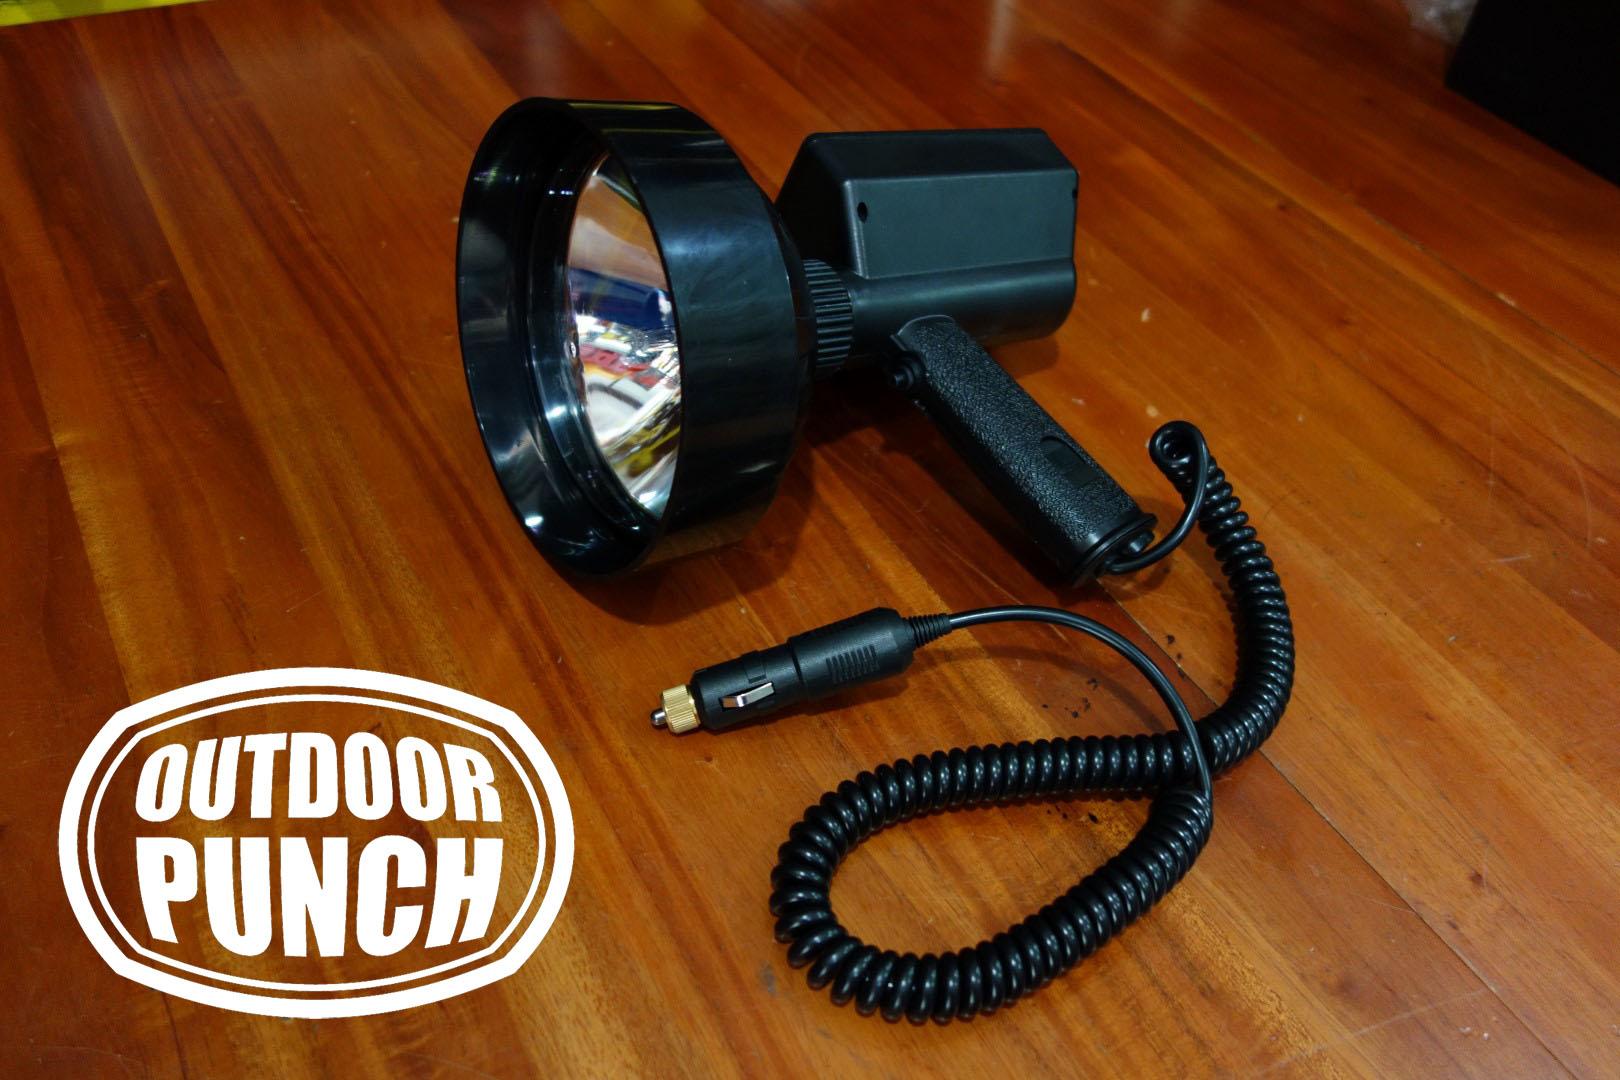 Hunting Spotlight HID Cigar Plug (Lampu Sorot Berburu)